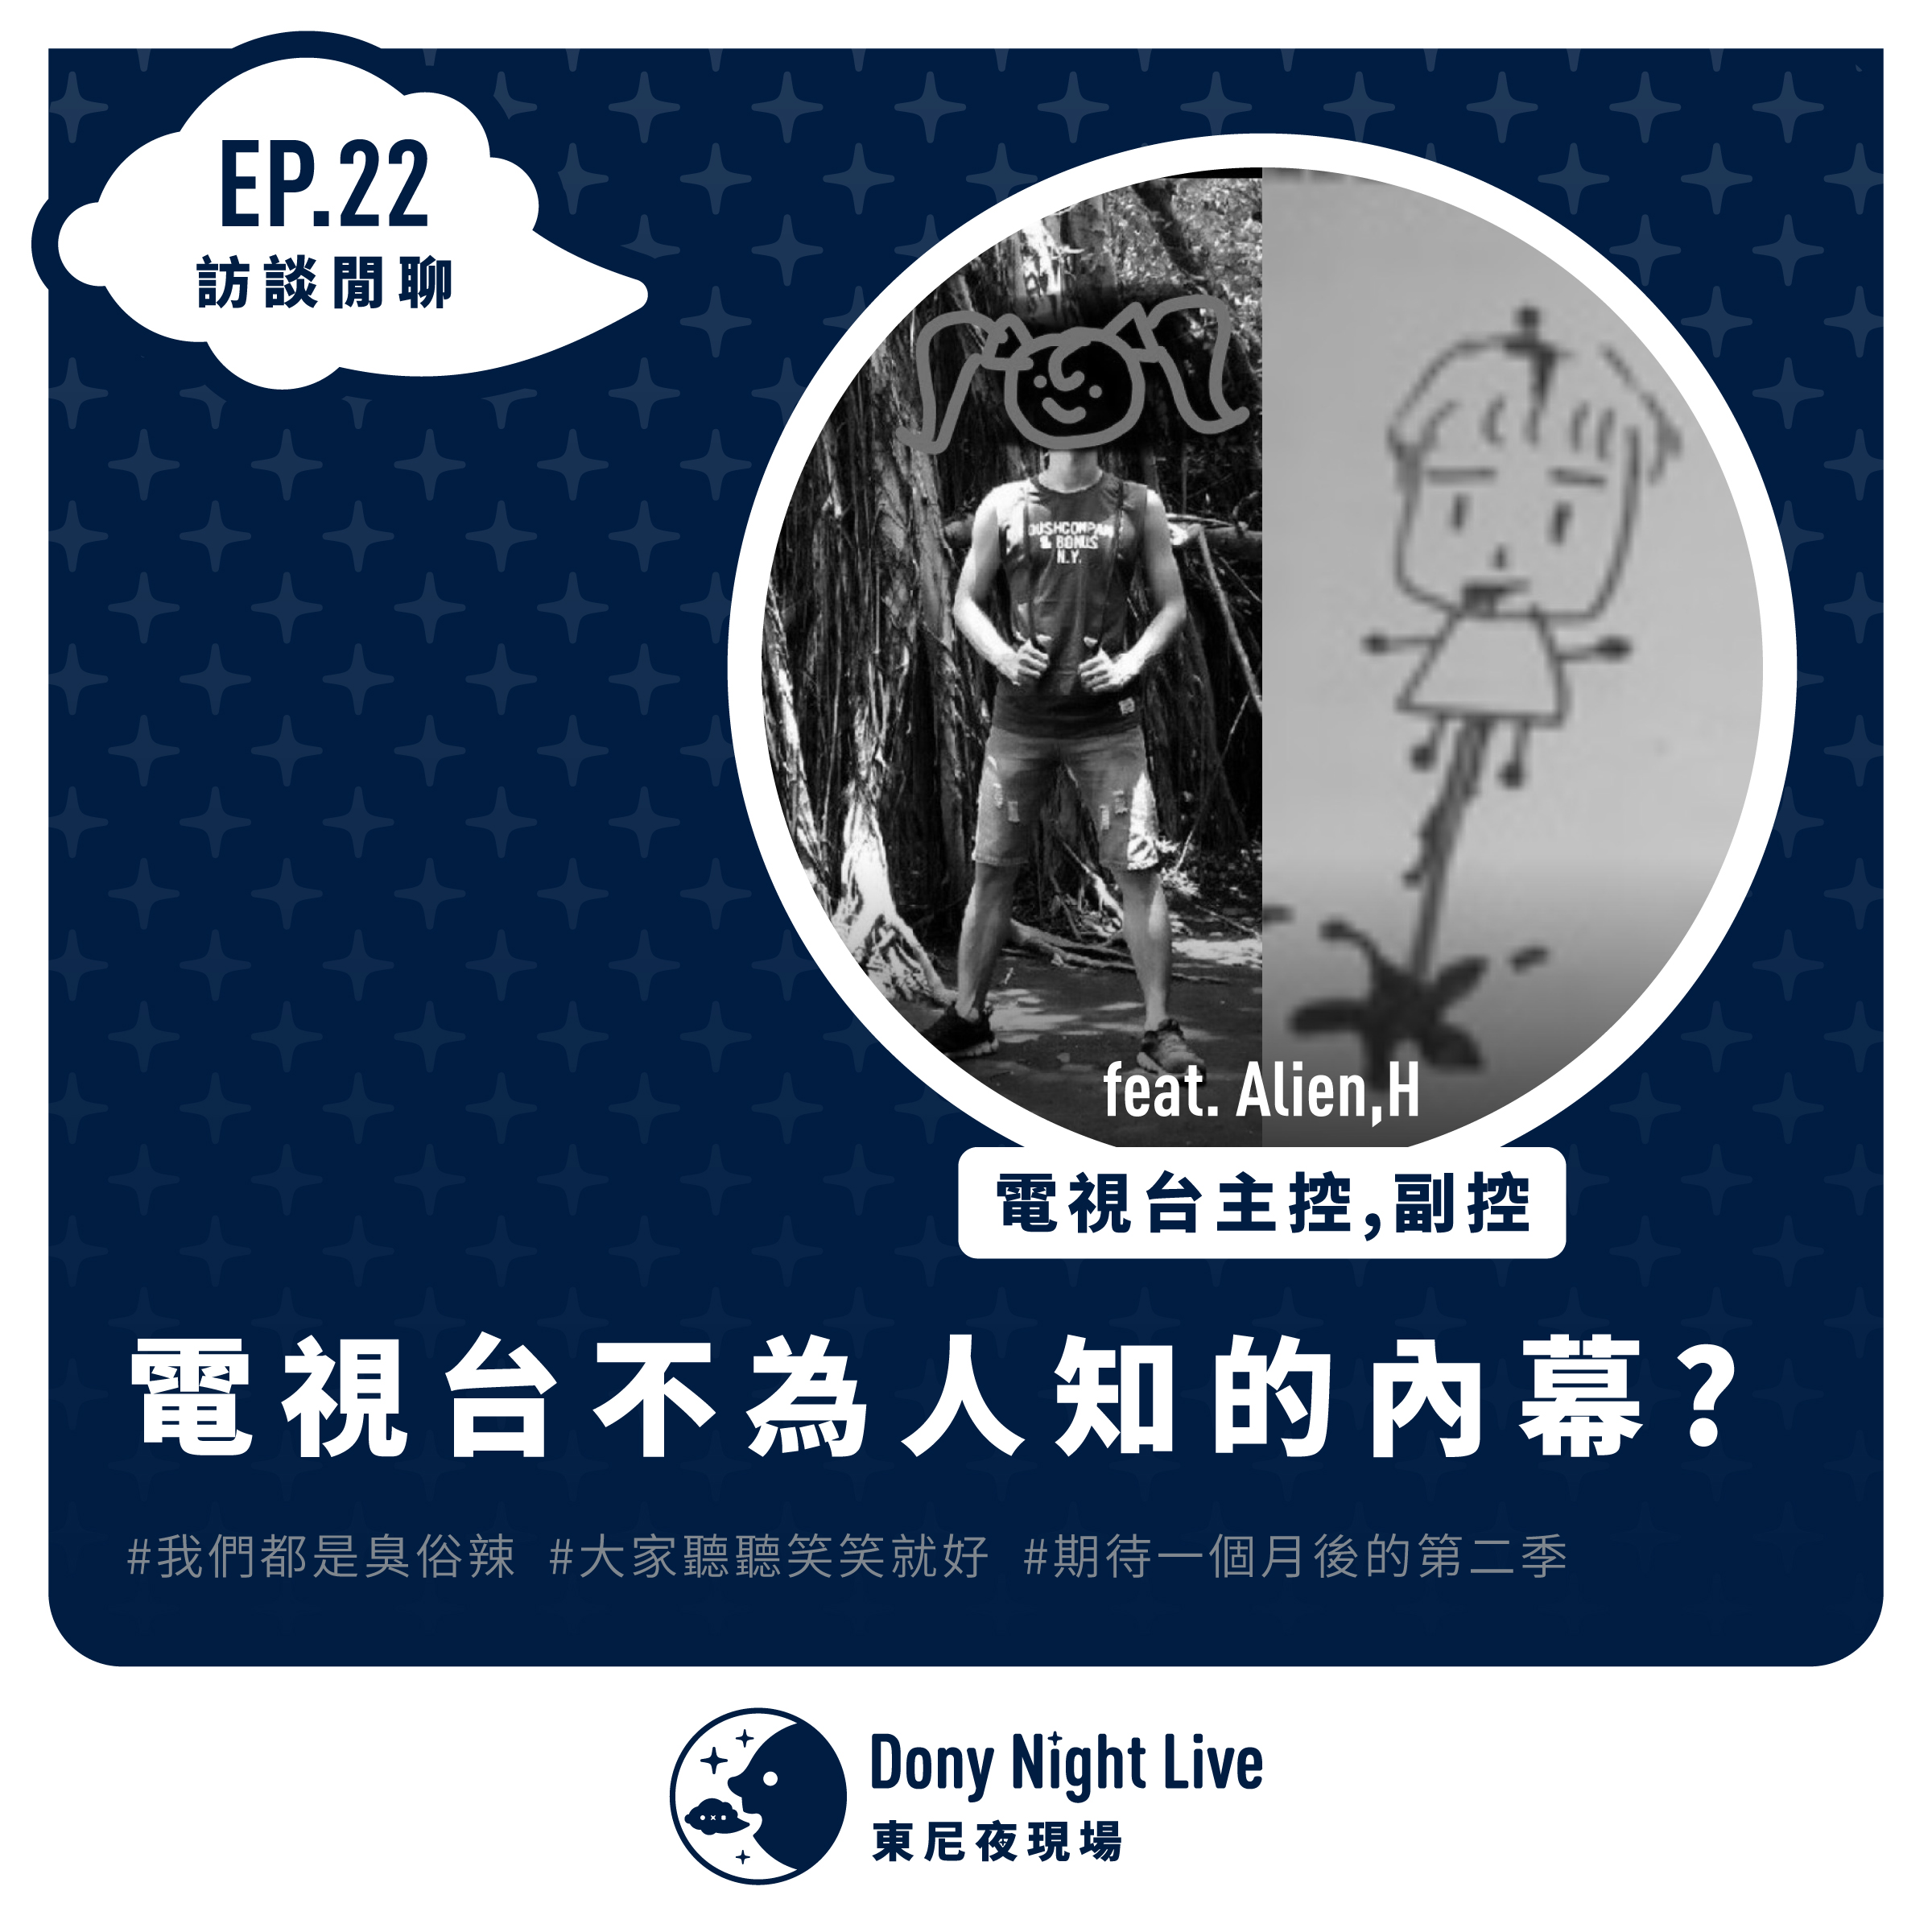 EP22【訪談閒聊】電視台主控,副控 / 電視台不為人知的內幕? ft.Alien,H